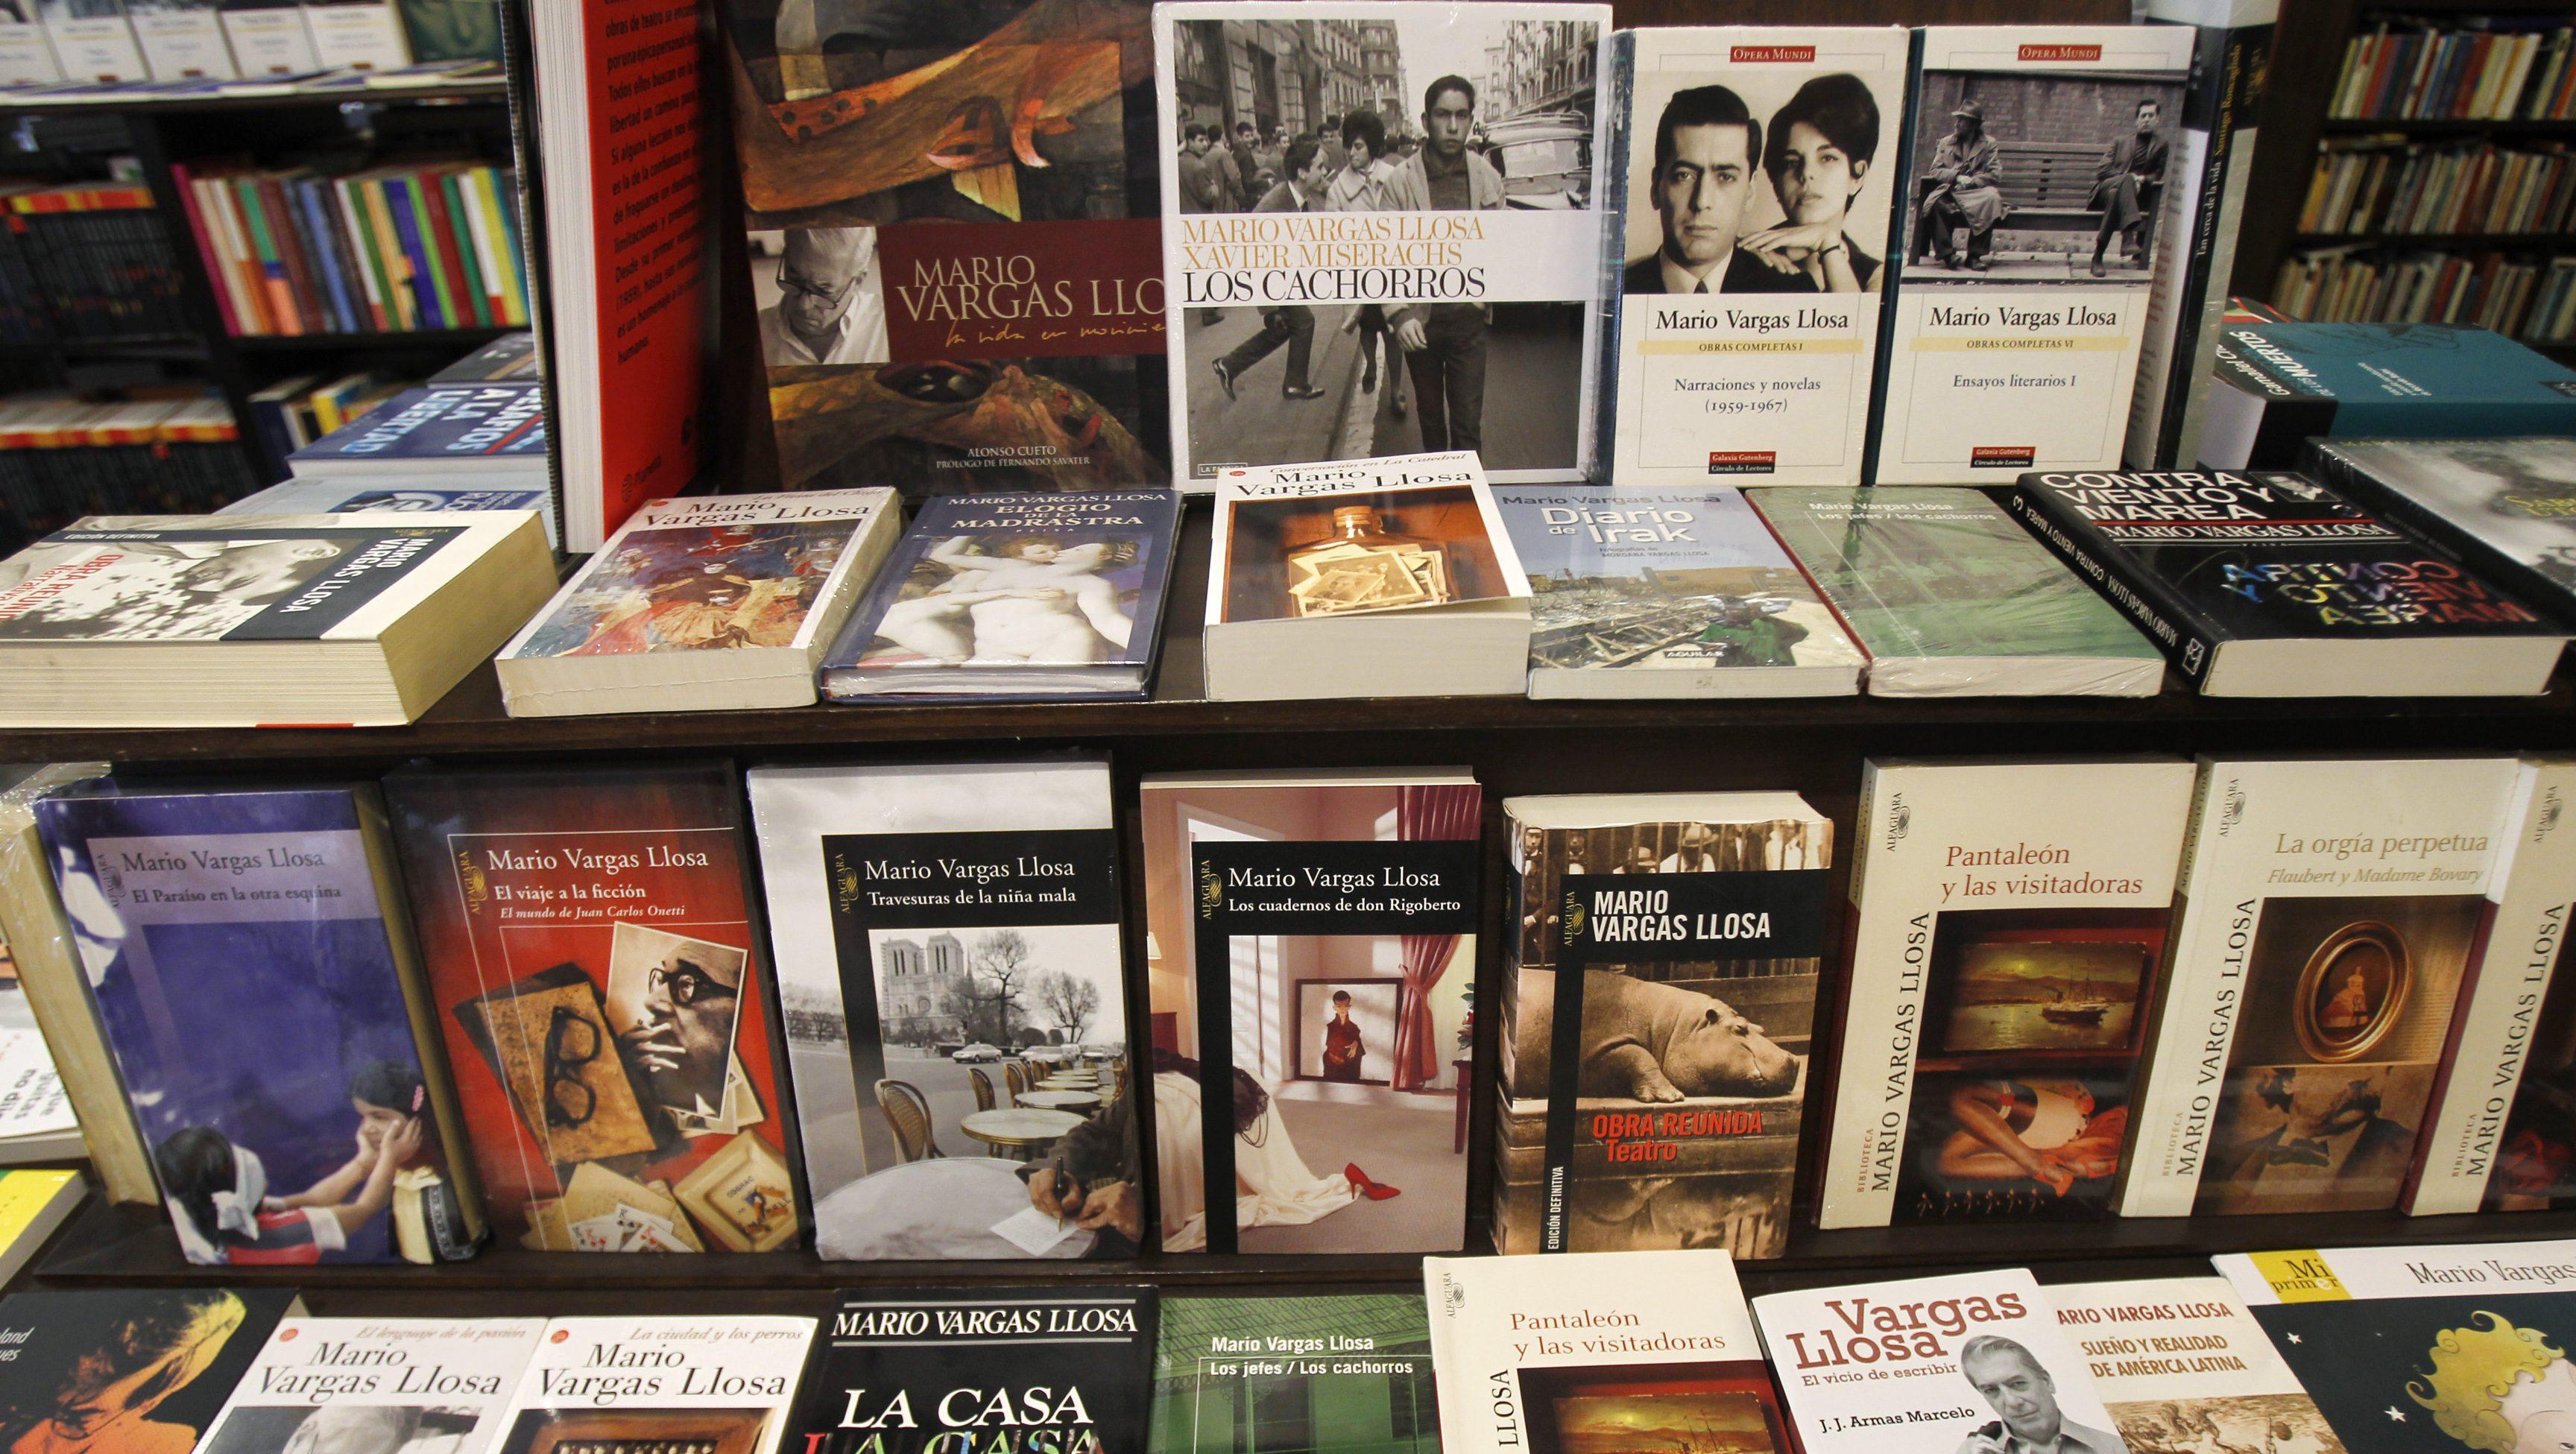 books by Mario Vargas Llosa